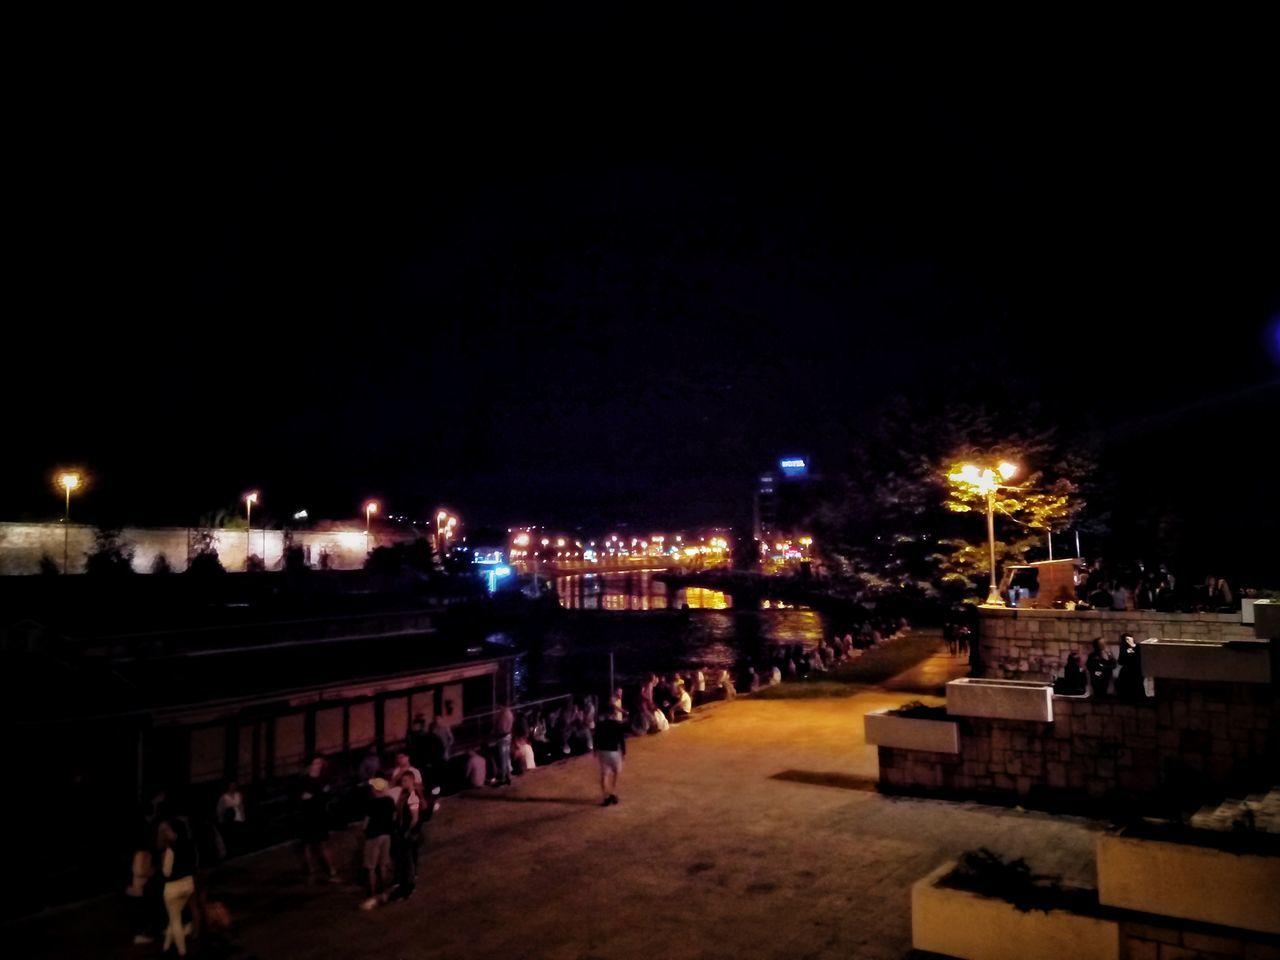 Night Celebration Large Group Of People Tree City People Landscape End of concert serbian rock group Kerber